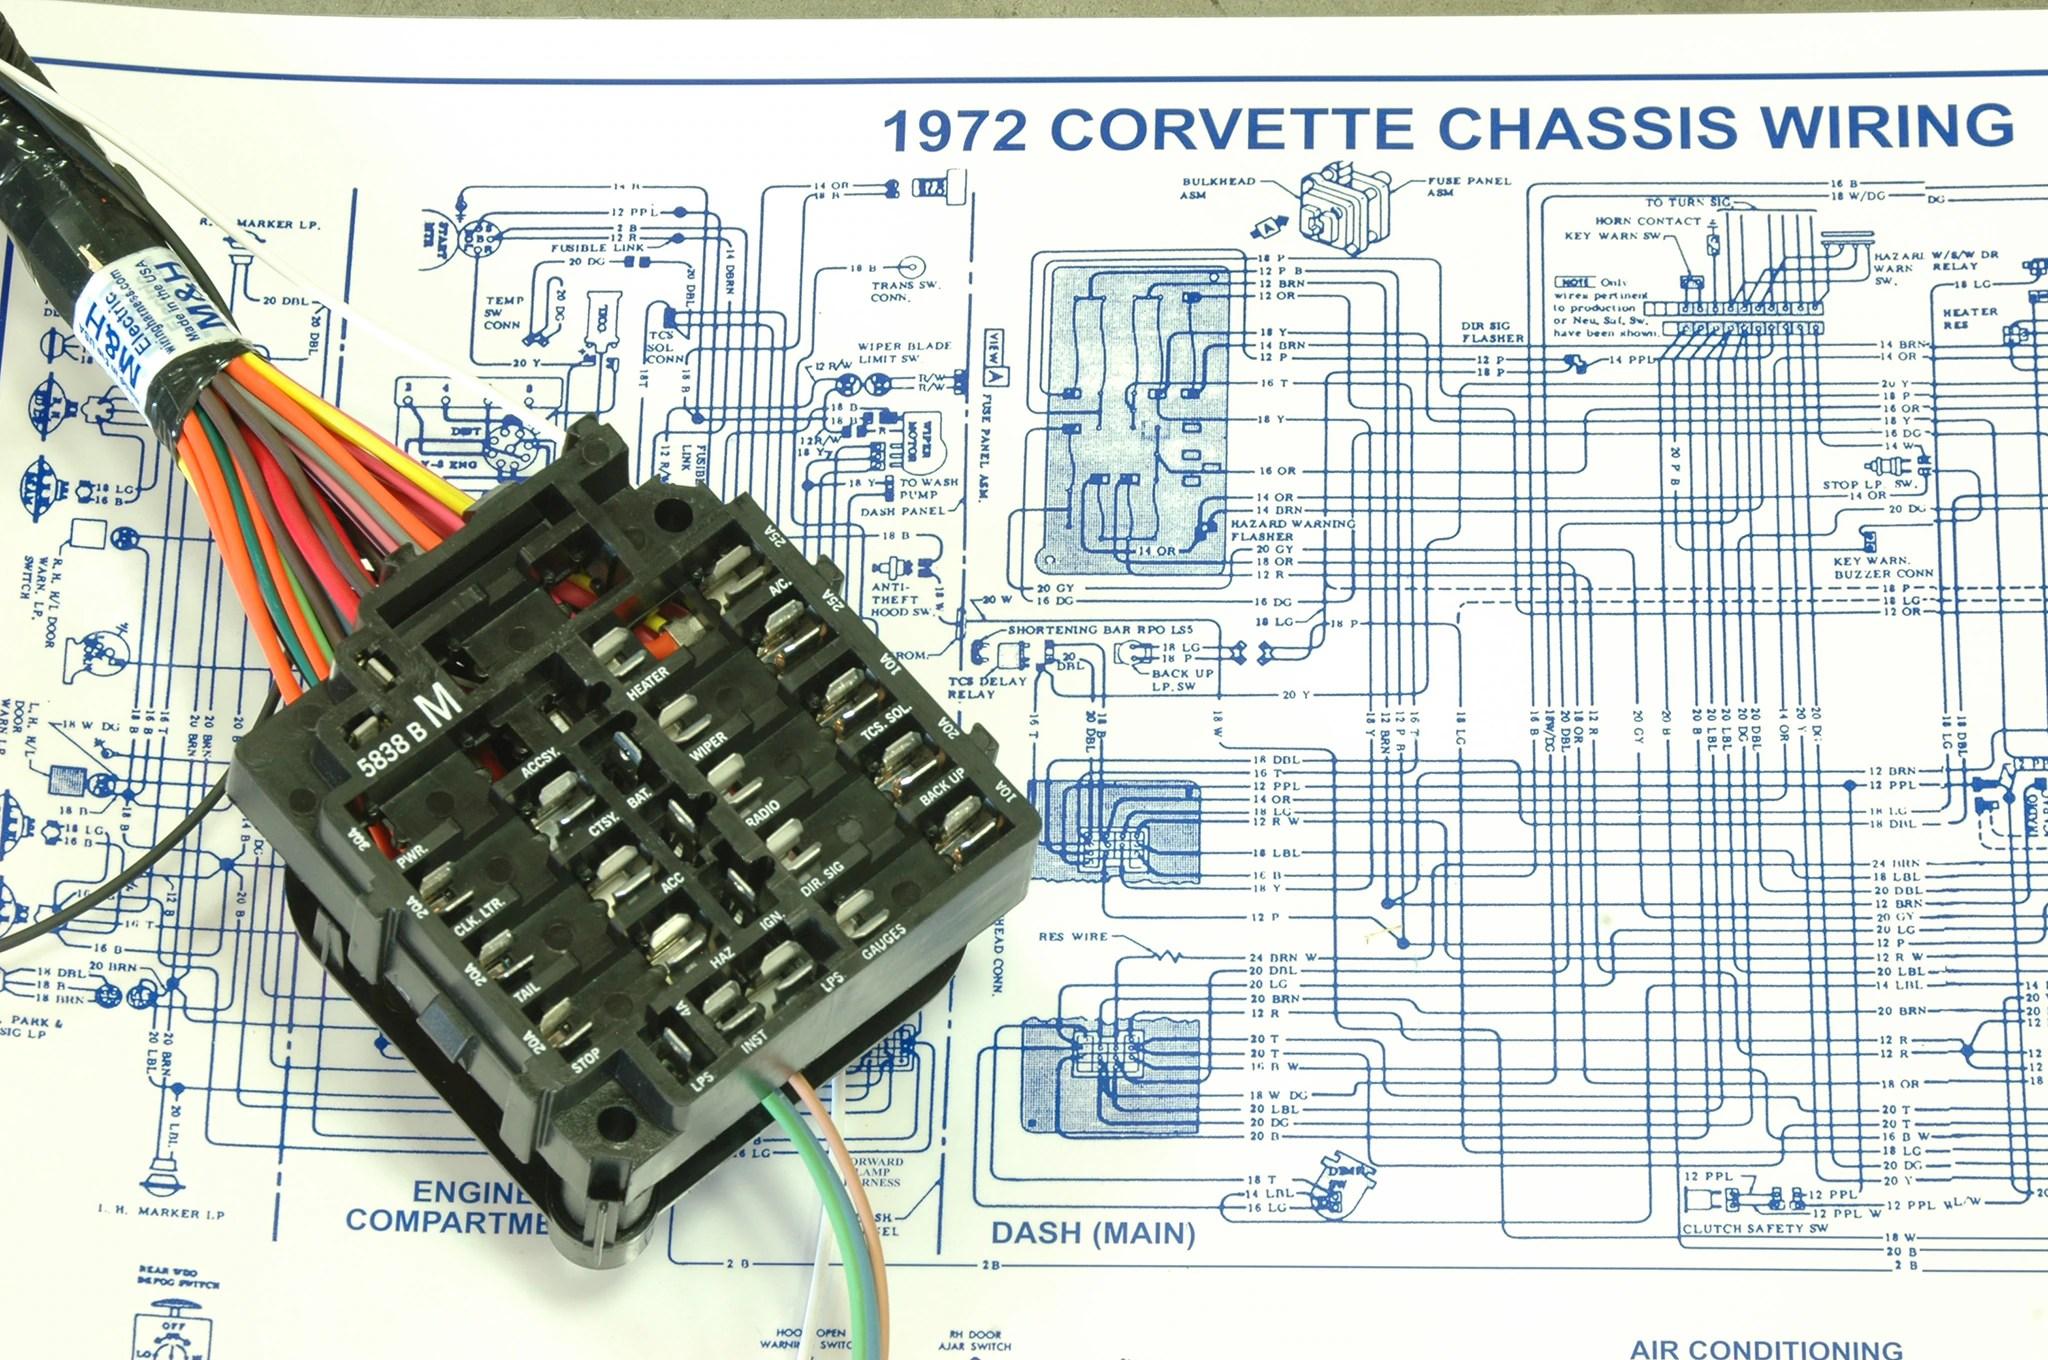 medium resolution of 1972 corvette scarlett project car dash wiring harness installation 72 chevelle wiring diagram 1972 corvette dash